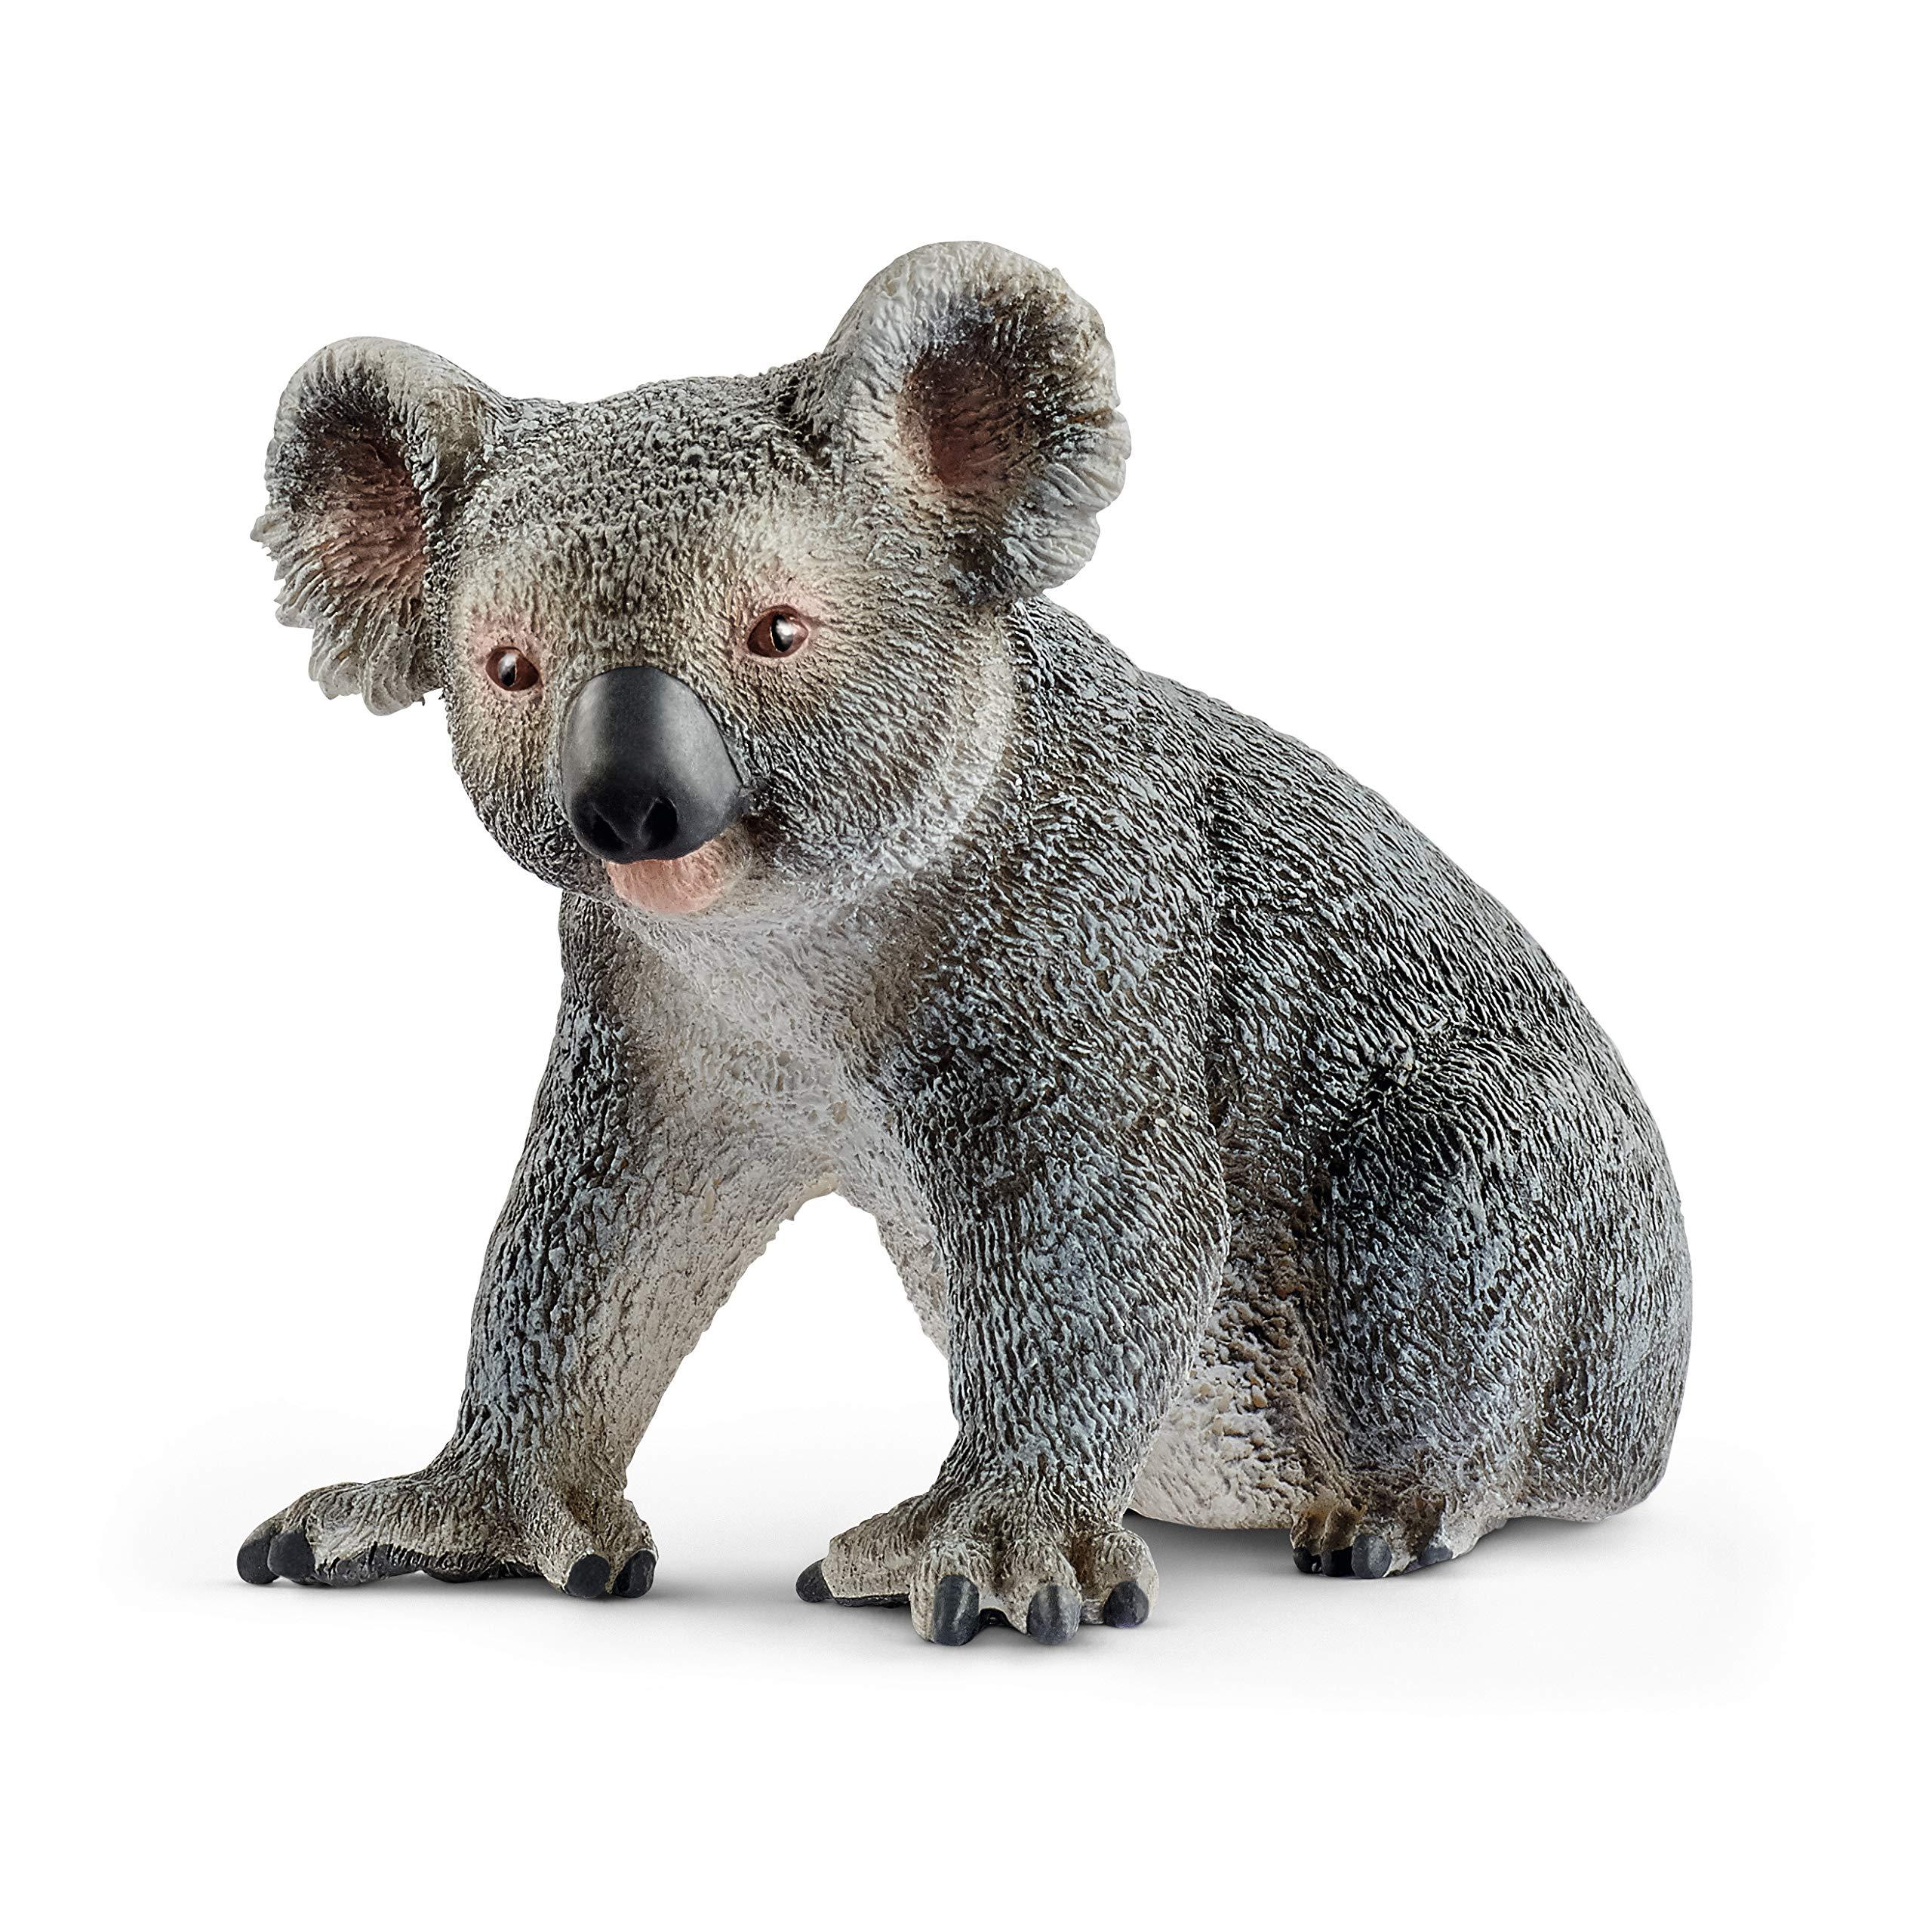 Schleich Wild Life, Animal Figurine, Animal Toys for Boys and Girls 3-8 Years Old, Koala Bear